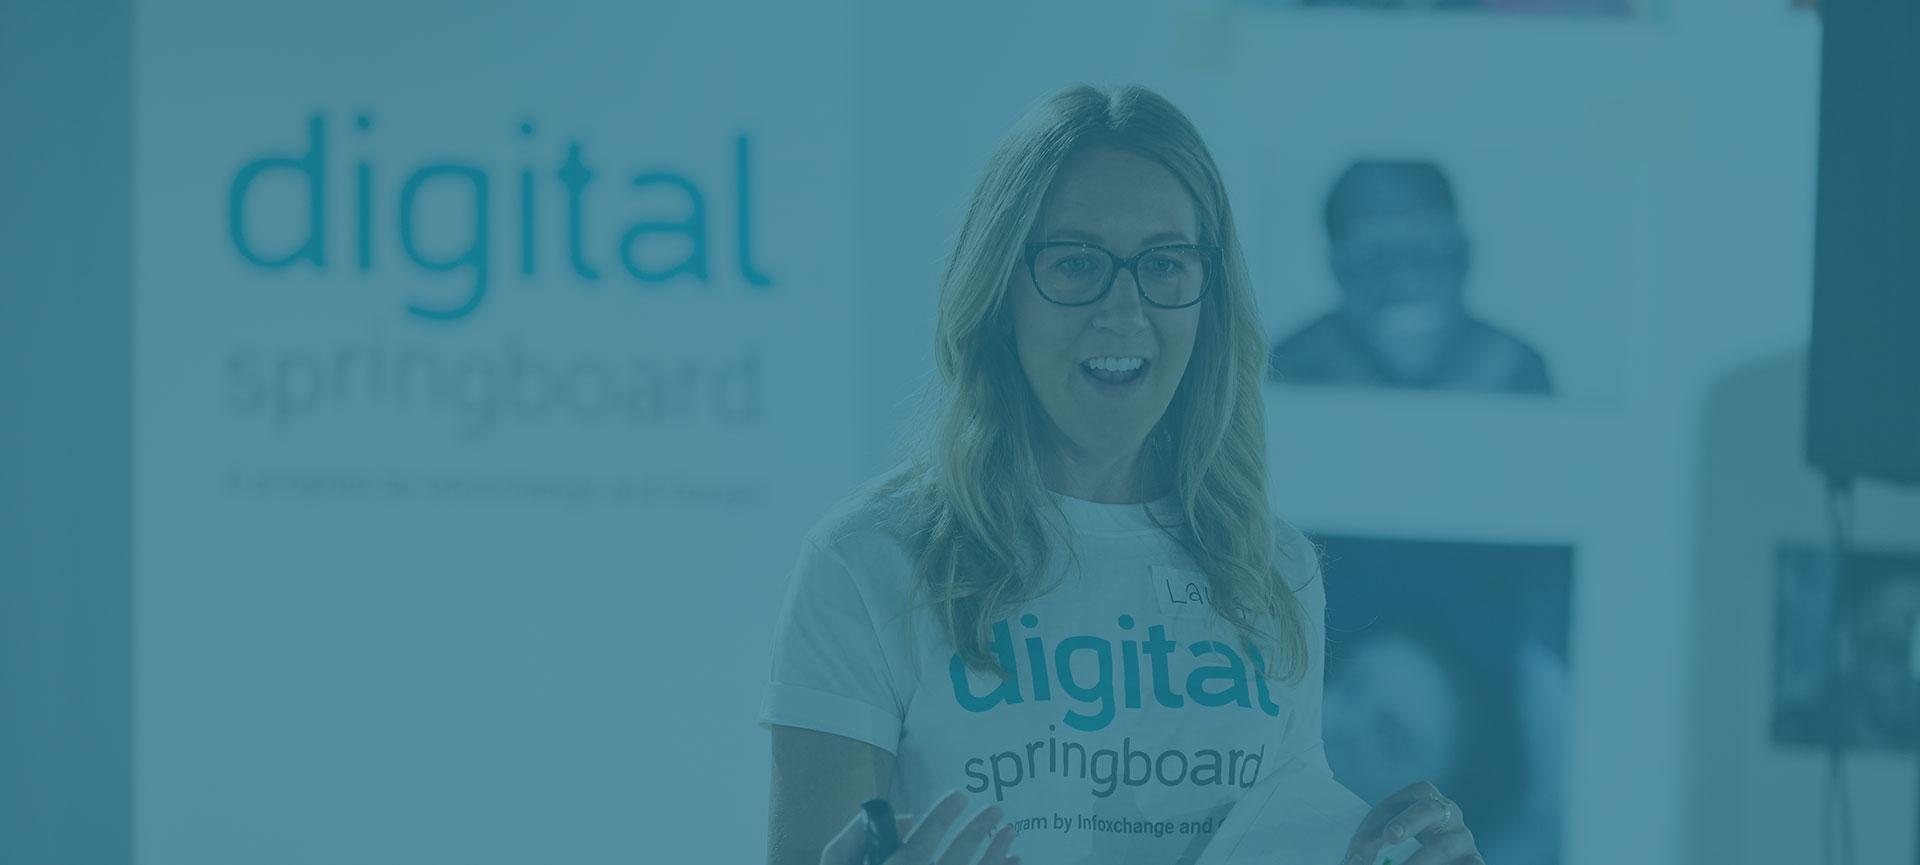 Trainer presenting Digital Springboard